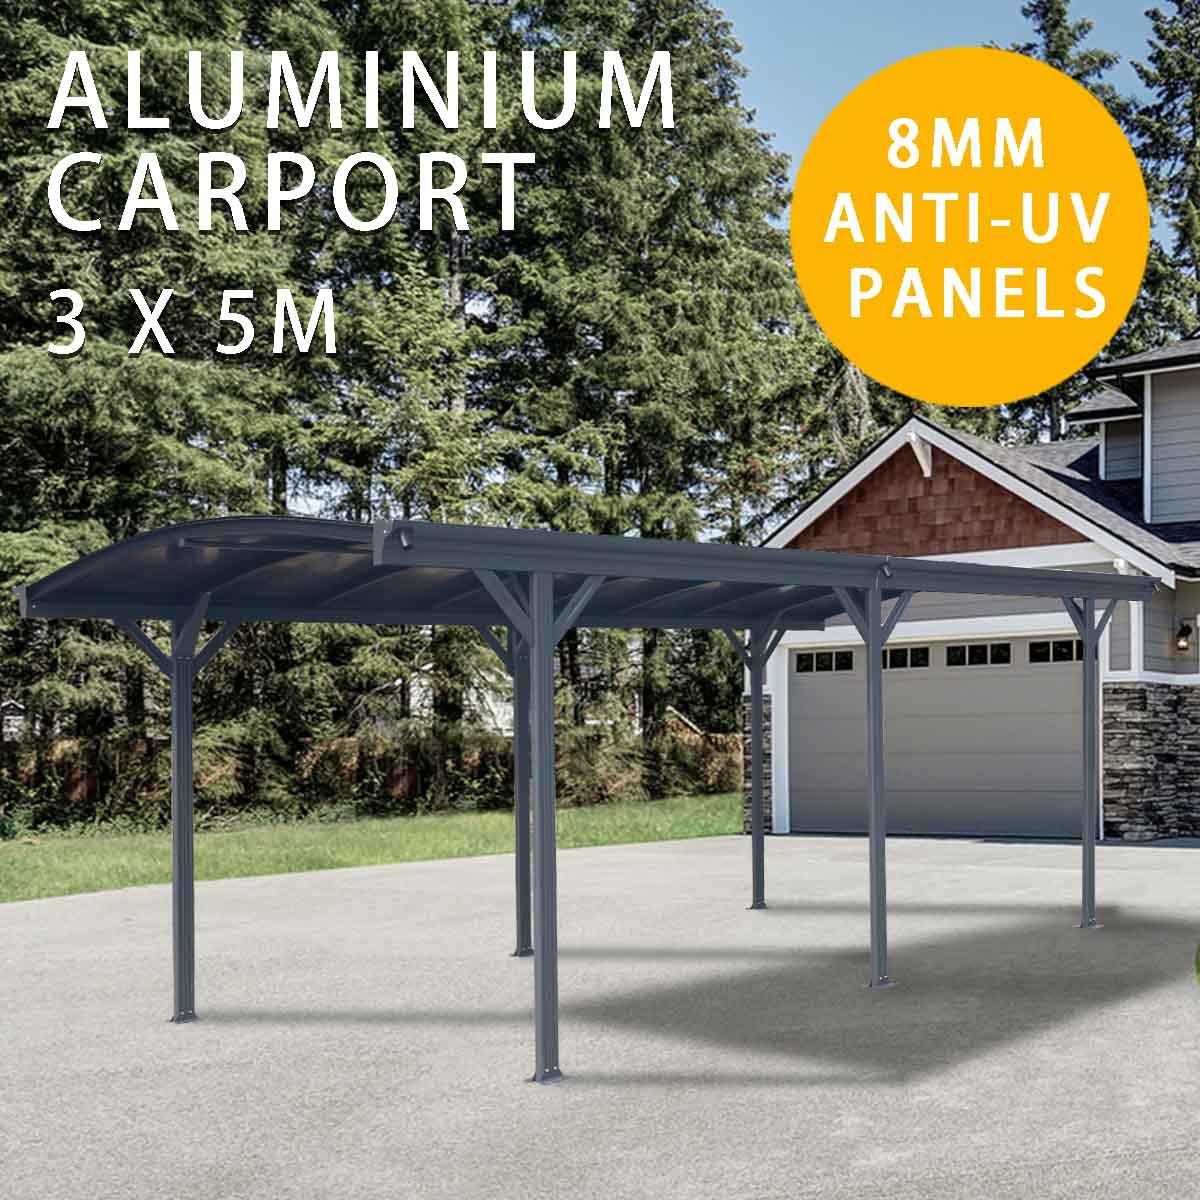 Carport 3m x 5m Outdoor Canopy Car Port Aluminium Portable ...